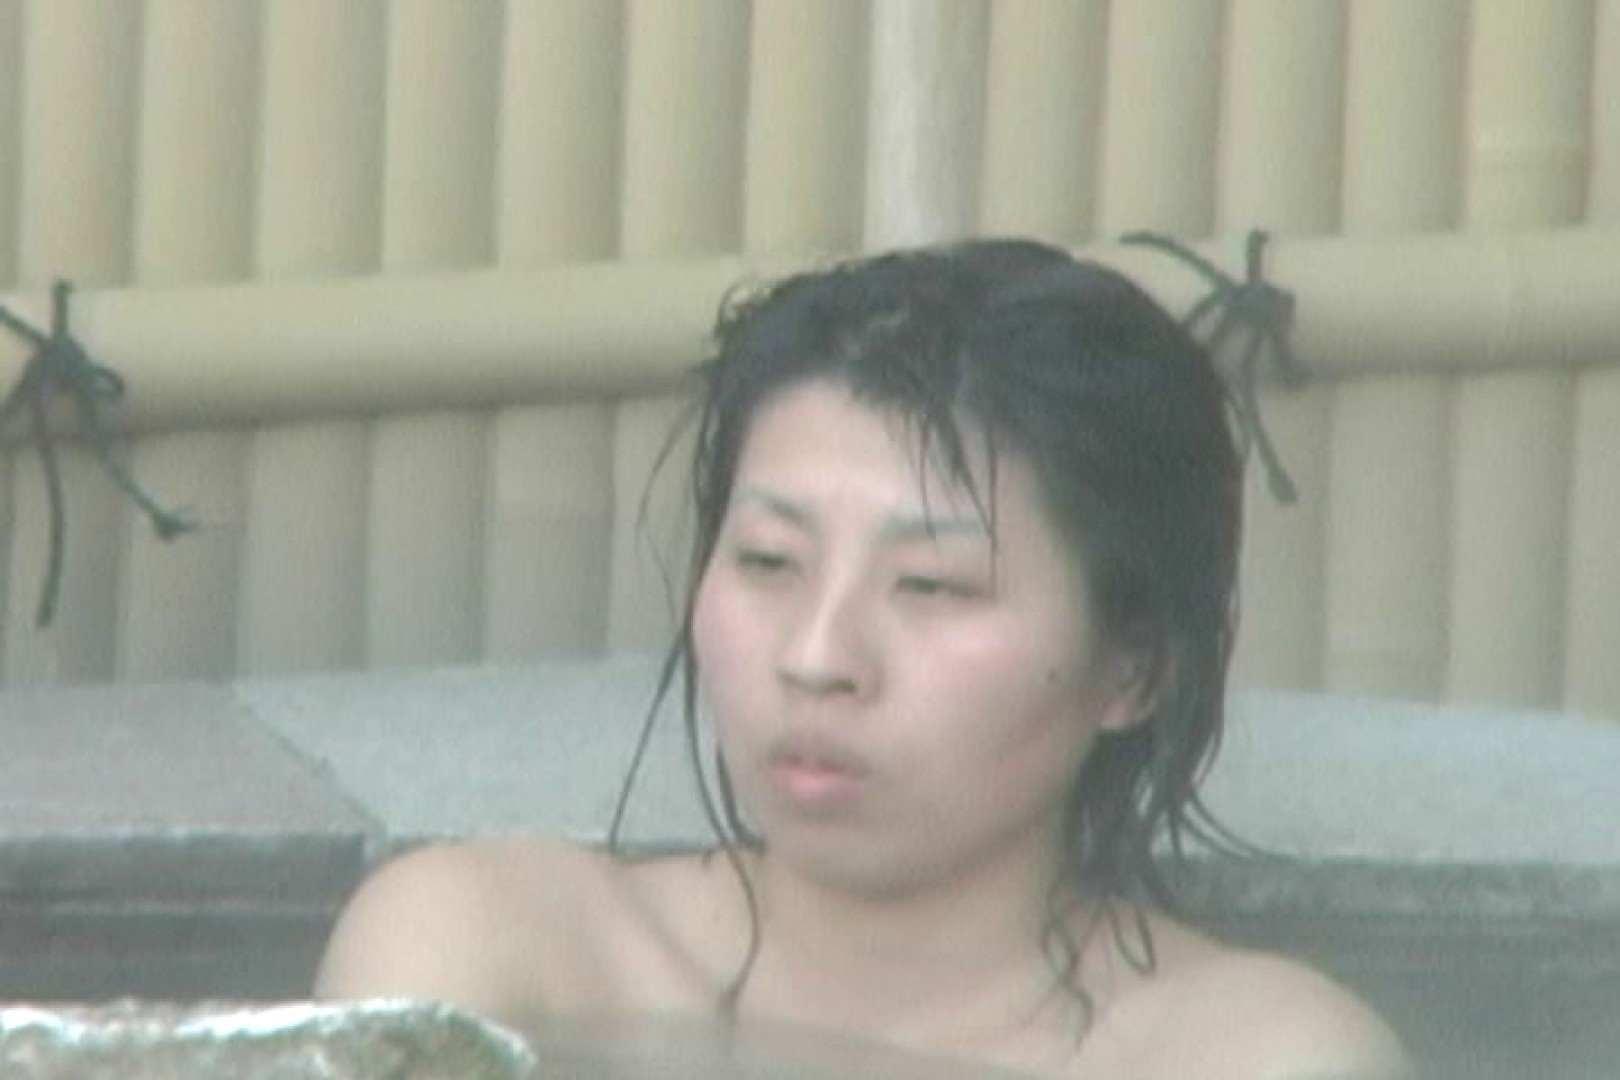 Aquaな露天風呂Vol.589 盗撮 | HなOL  105pic 38